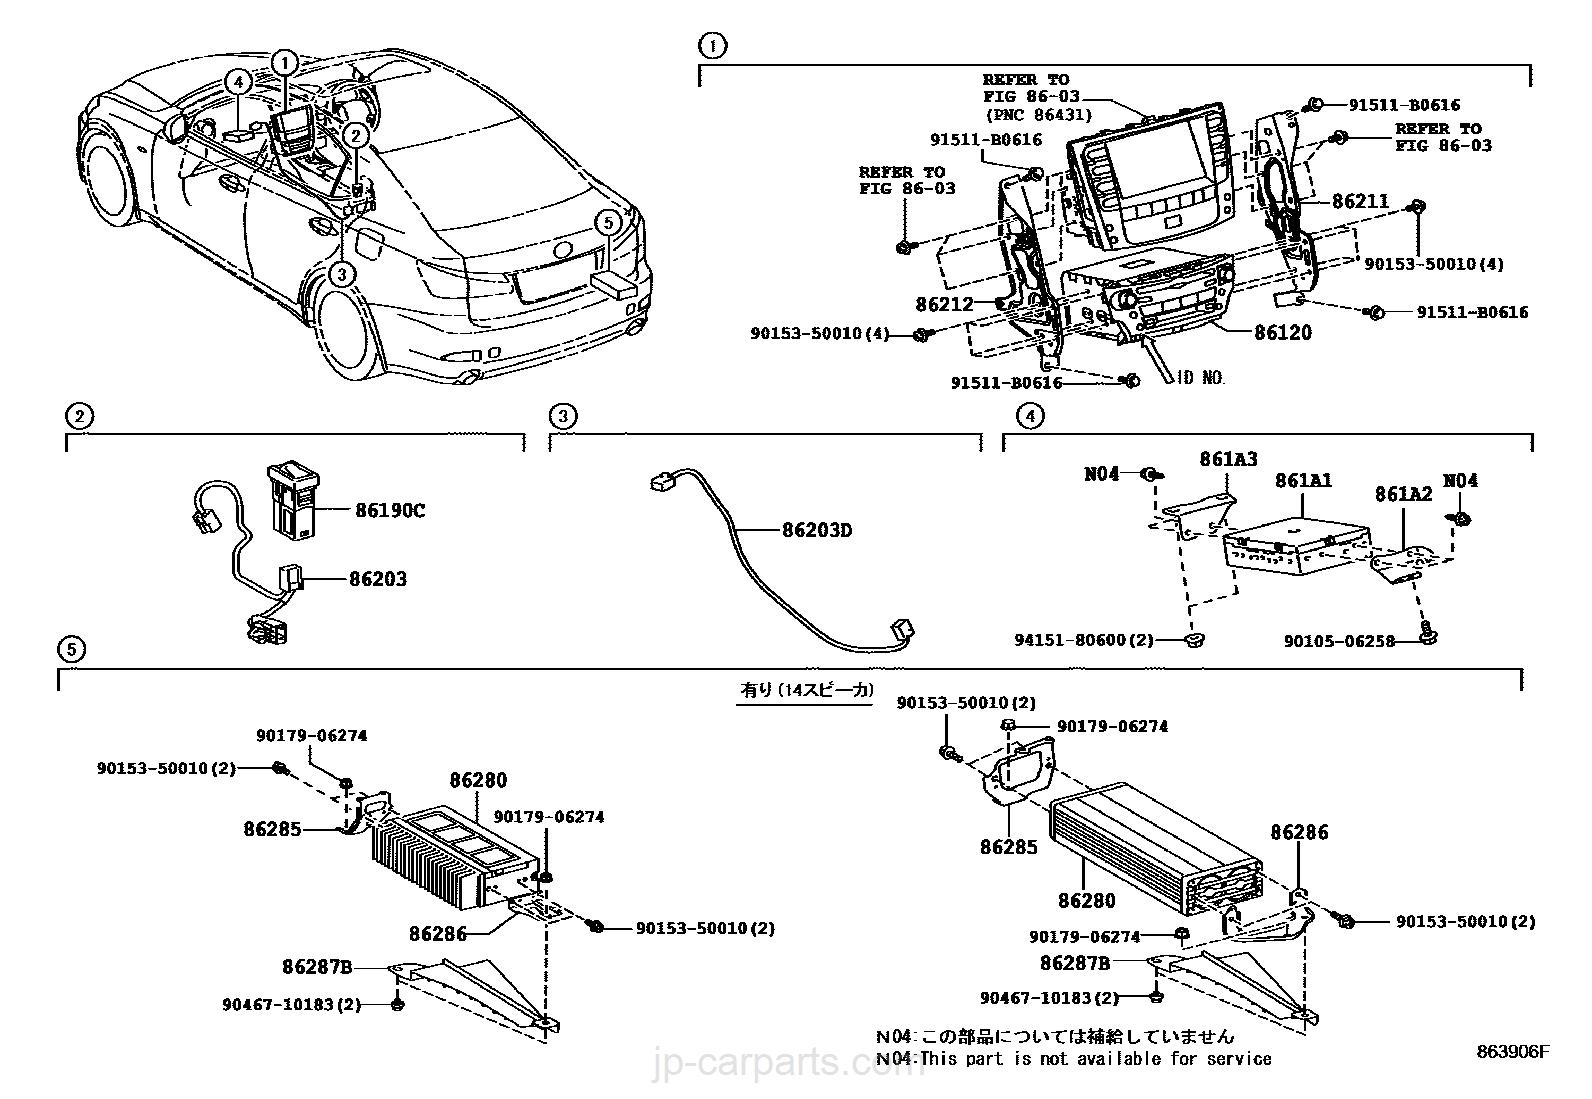 Pioneer 86280 50010 Wiring Diagram Free Download Jp Radio Receiver Amplifier Condenser Lexus Part Listjp